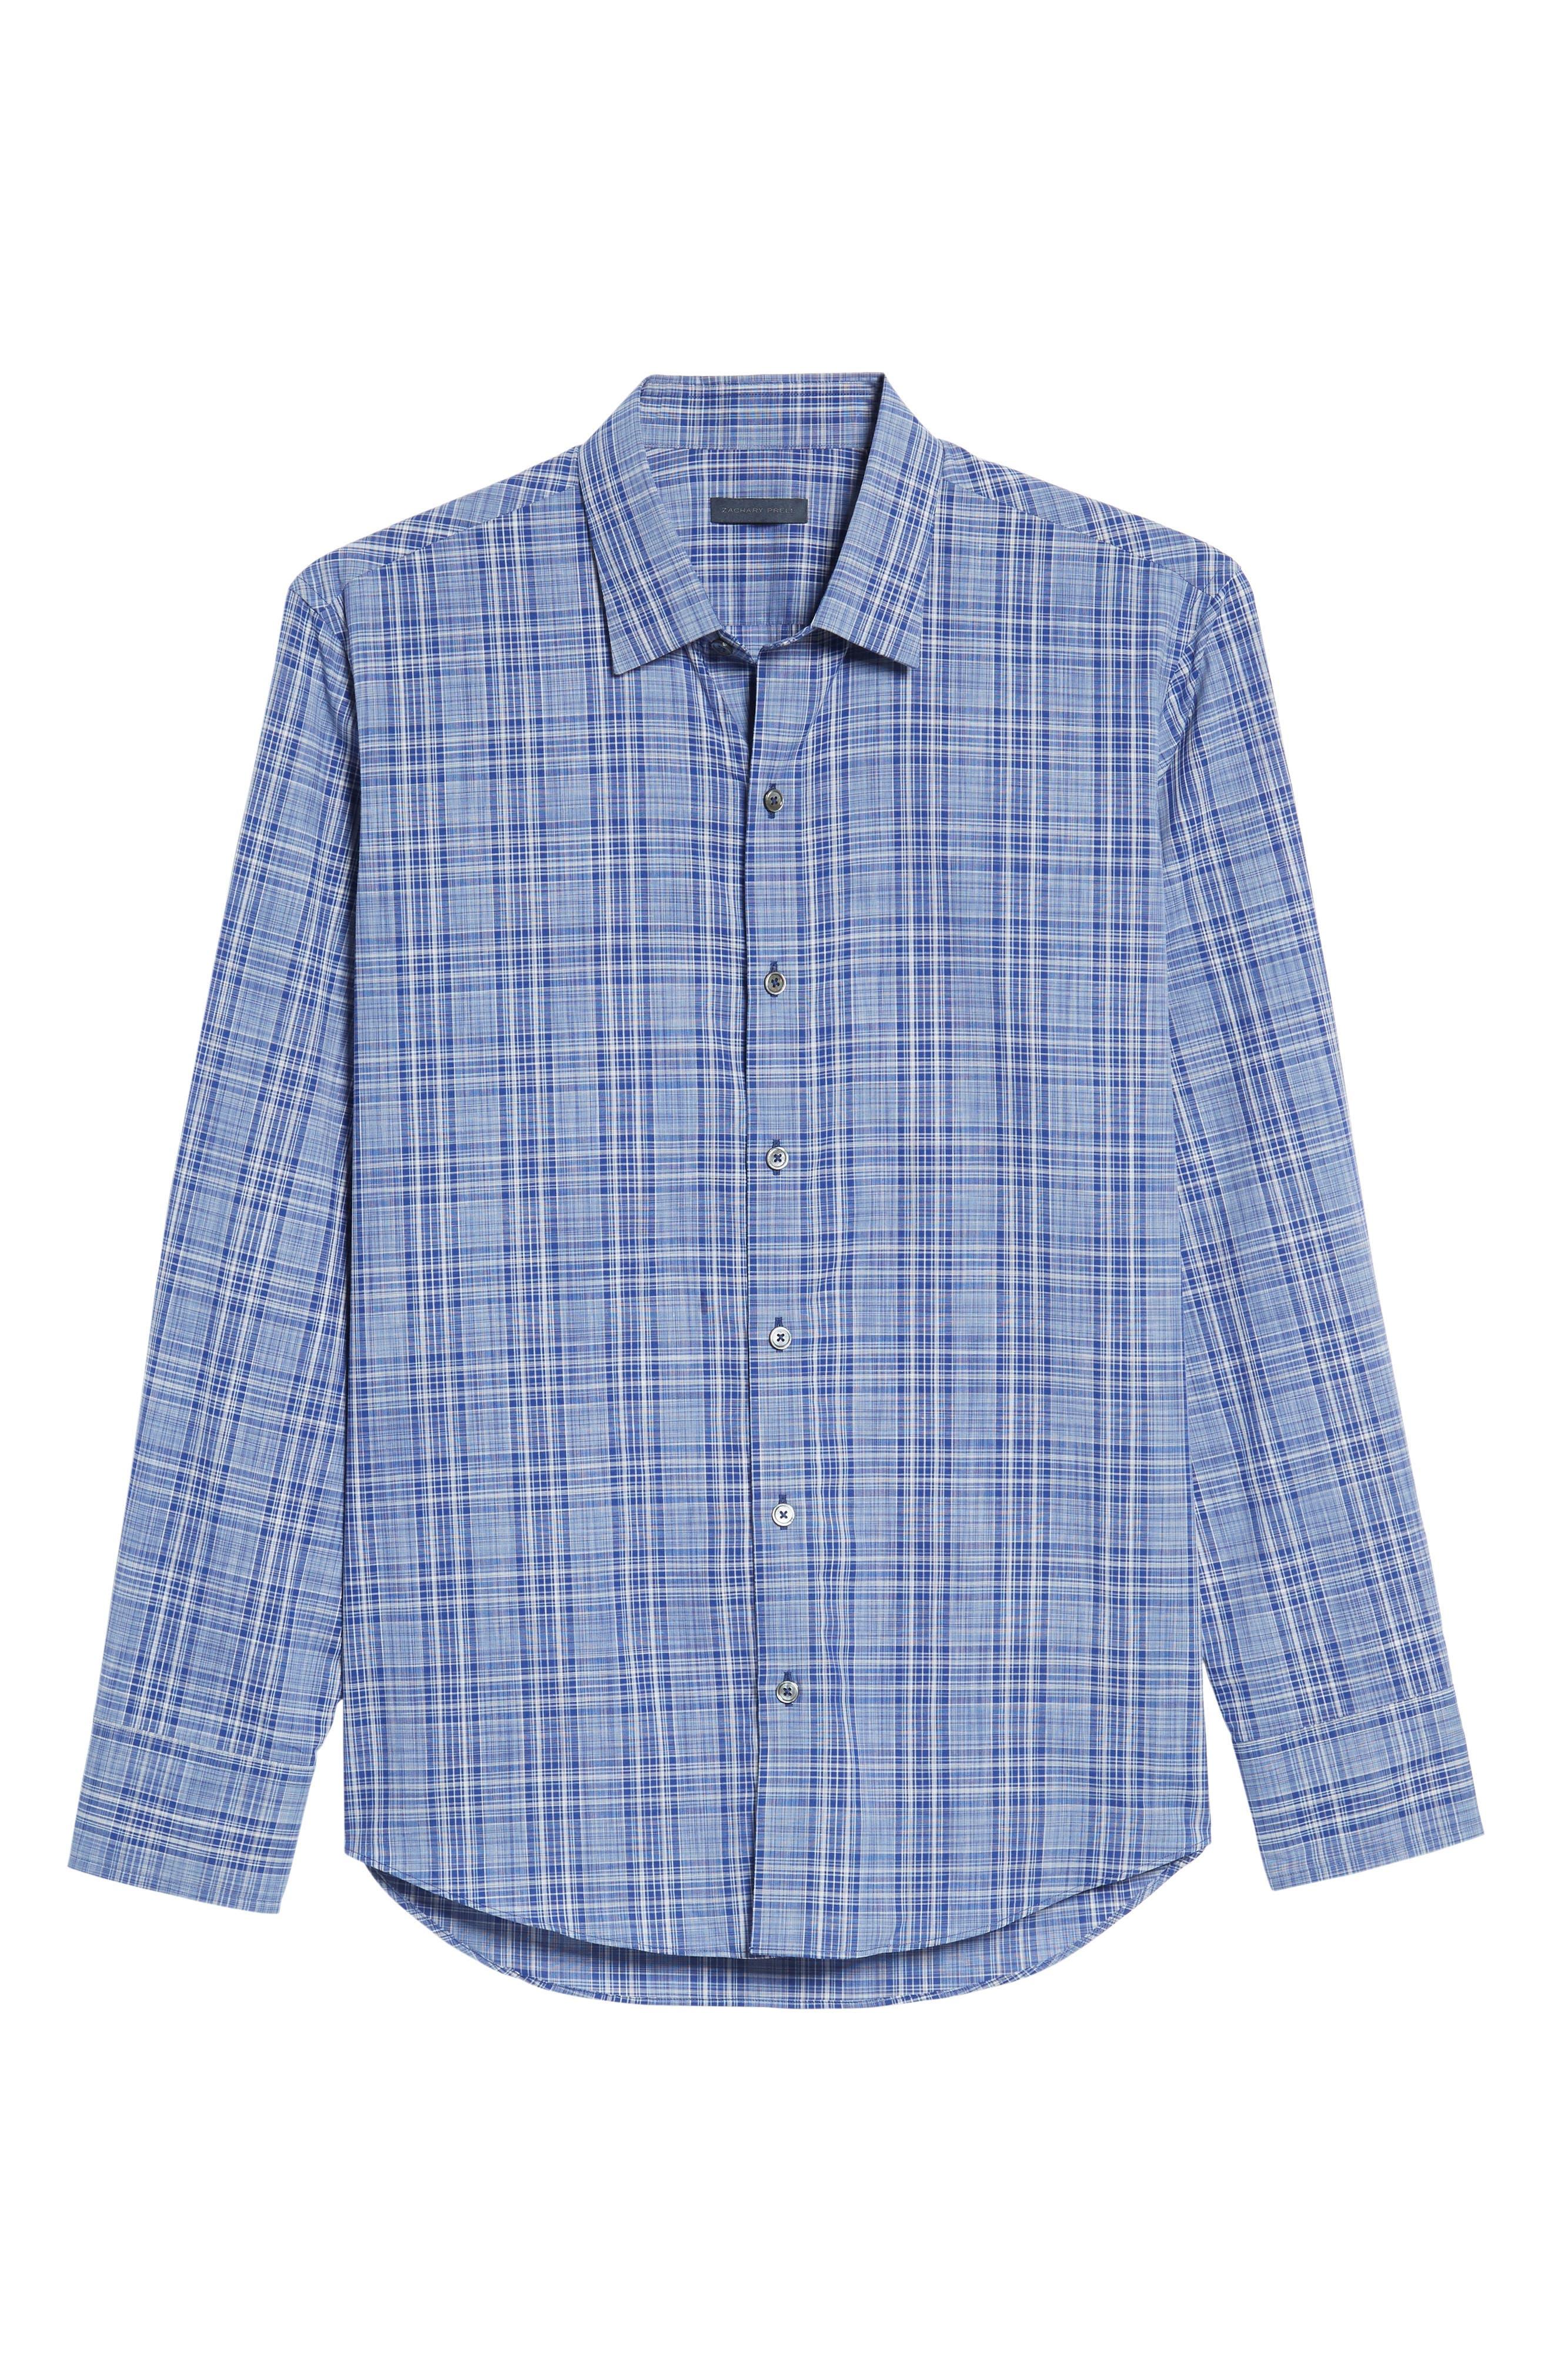 Wein Slim Fit Check Sport Shirt,                             Alternate thumbnail 6, color,                             401